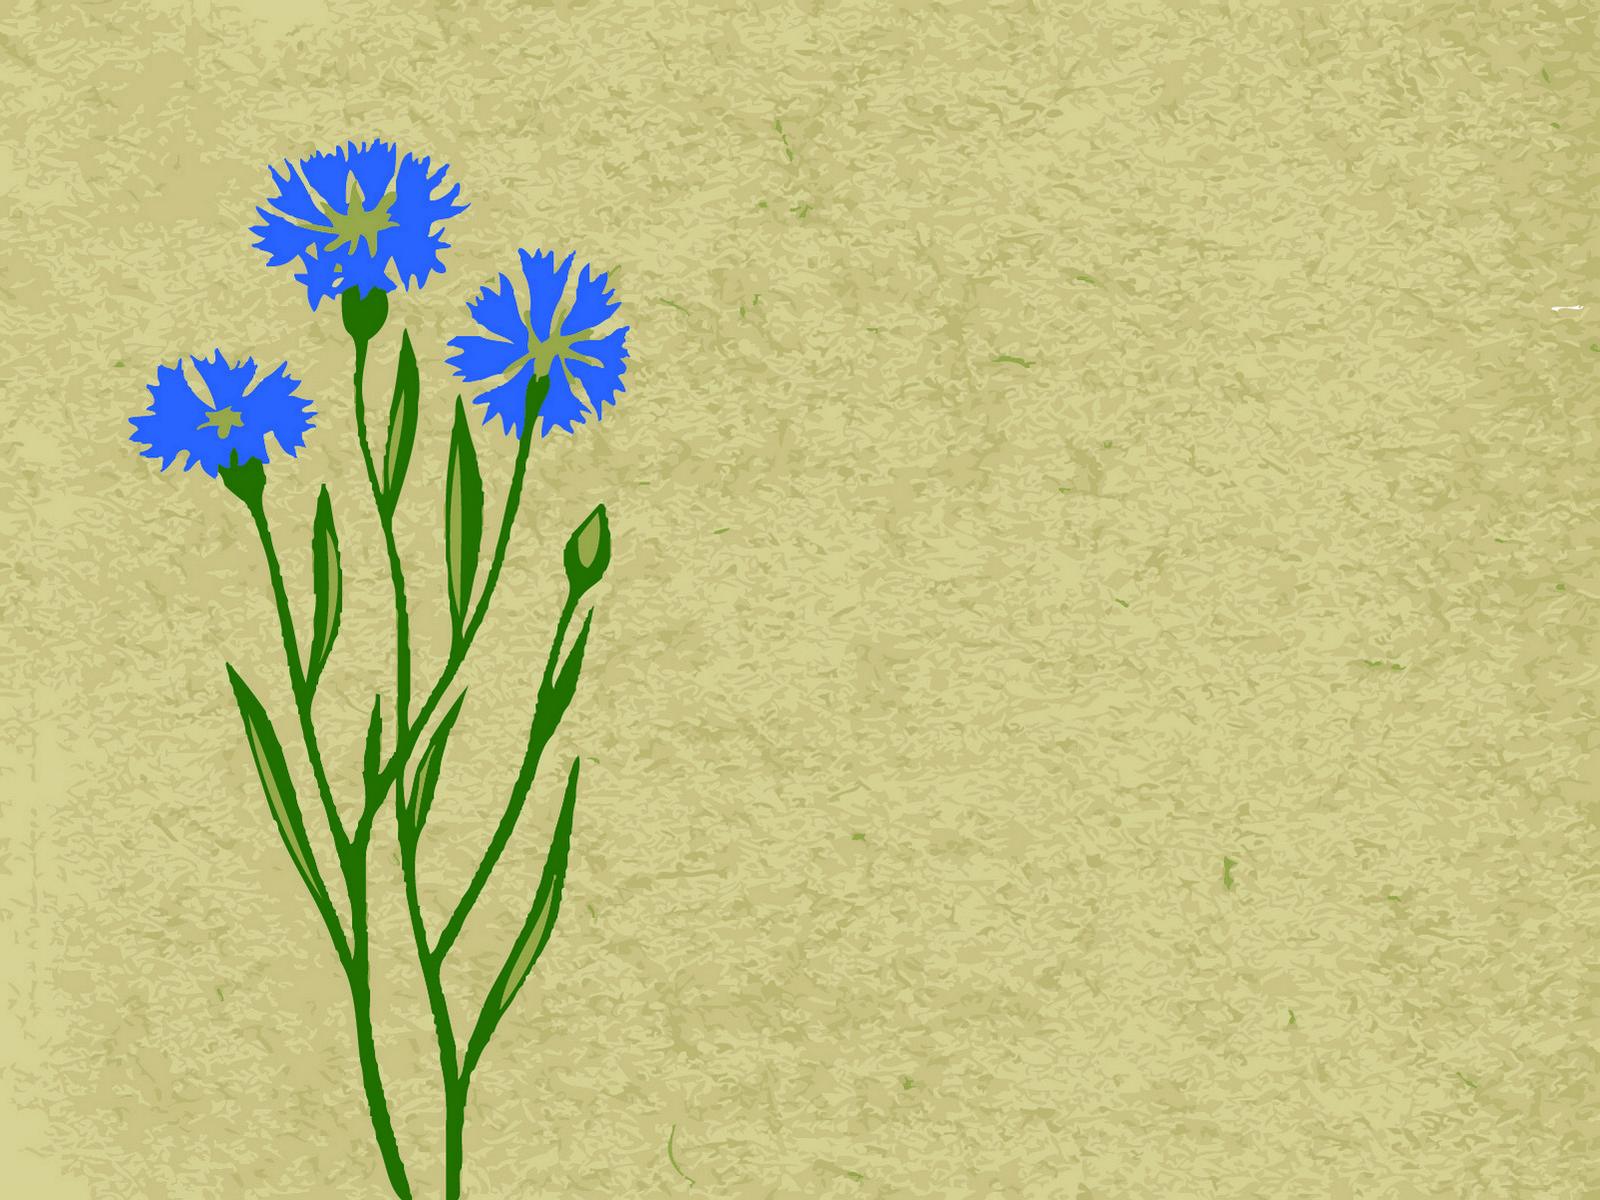 Blue Cloves PPT Backgrounds